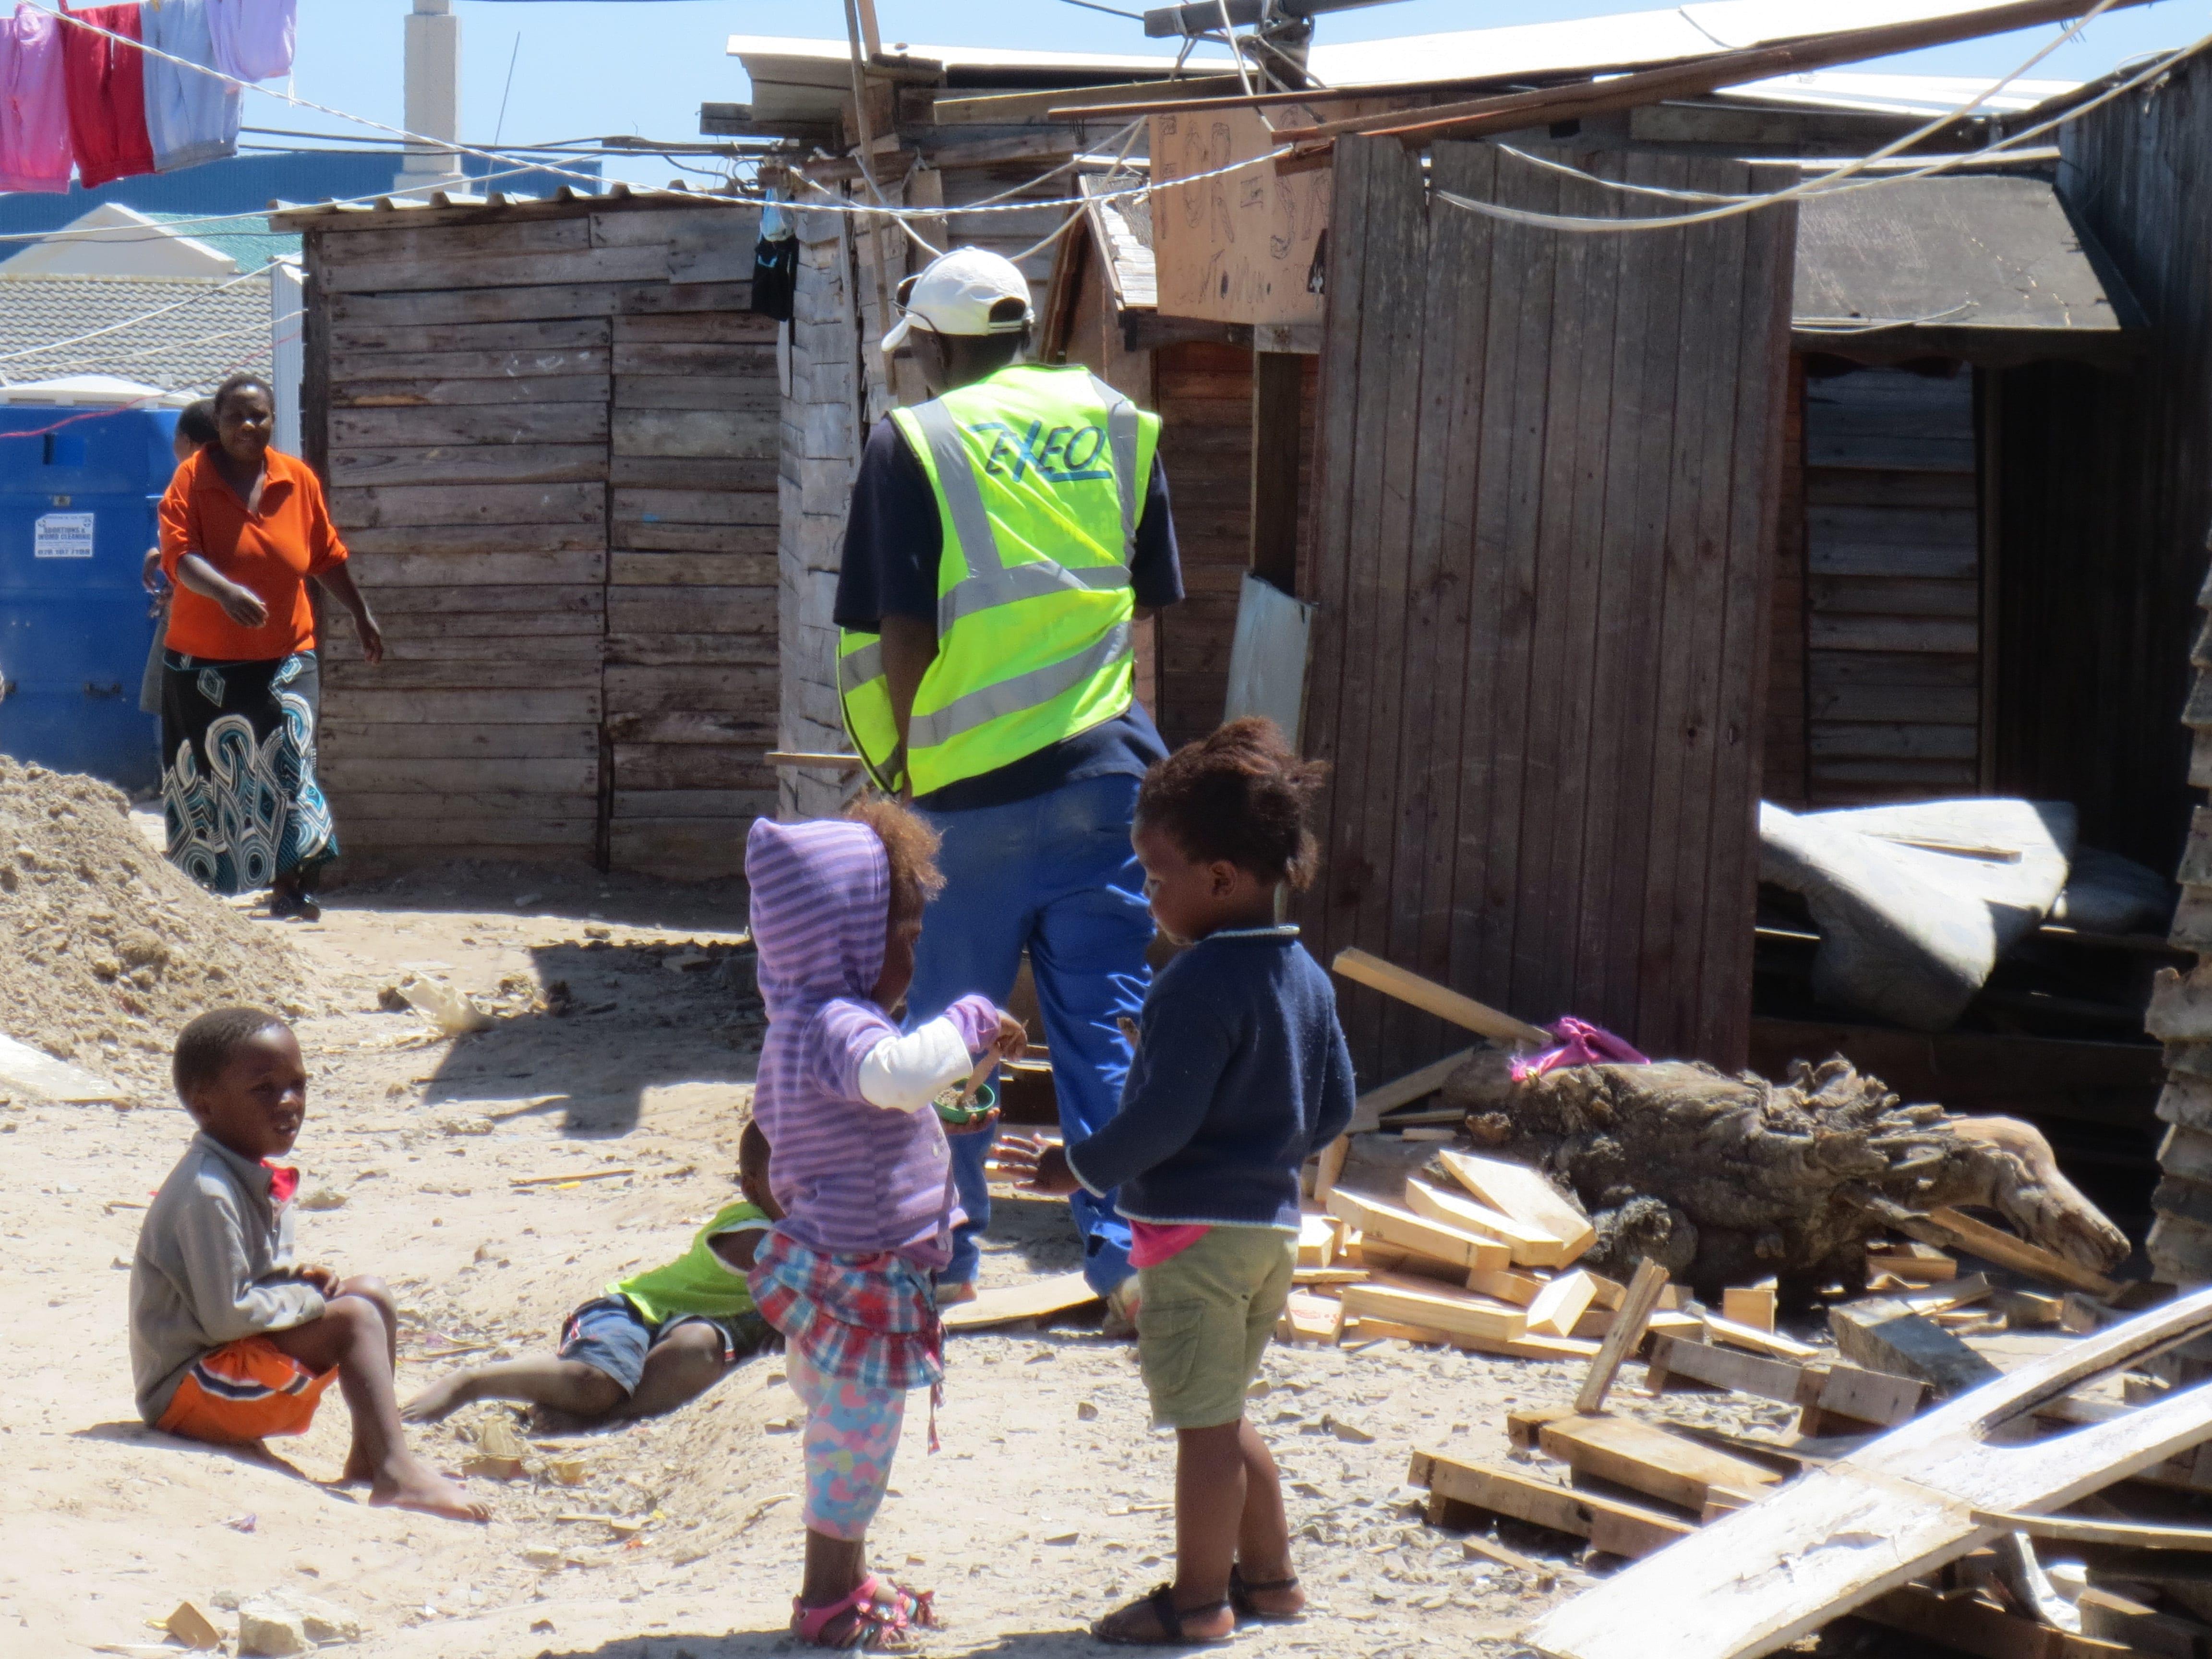 Everyday scene in Mtshini Wam. Joe Slovo Park, located in Milnerton, Cape  Town, South Africa ... aa7bc1b42b32